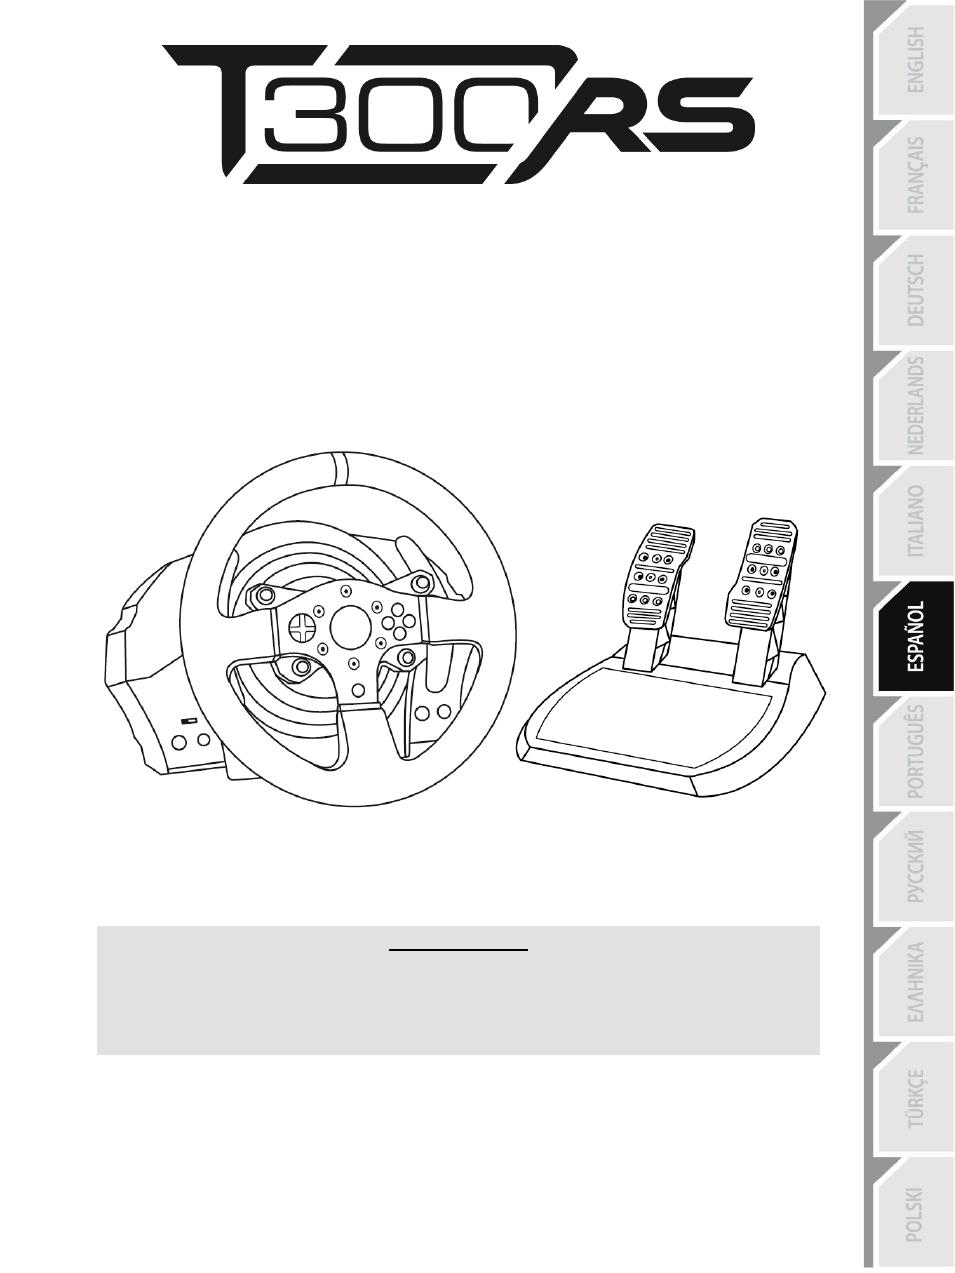 06 spa t300rs ps3 ps4 espa ol thrustmaster t300 ferrari gte user rh manualsdir com PS3 Slim Back PS3 Fuzzy Screen